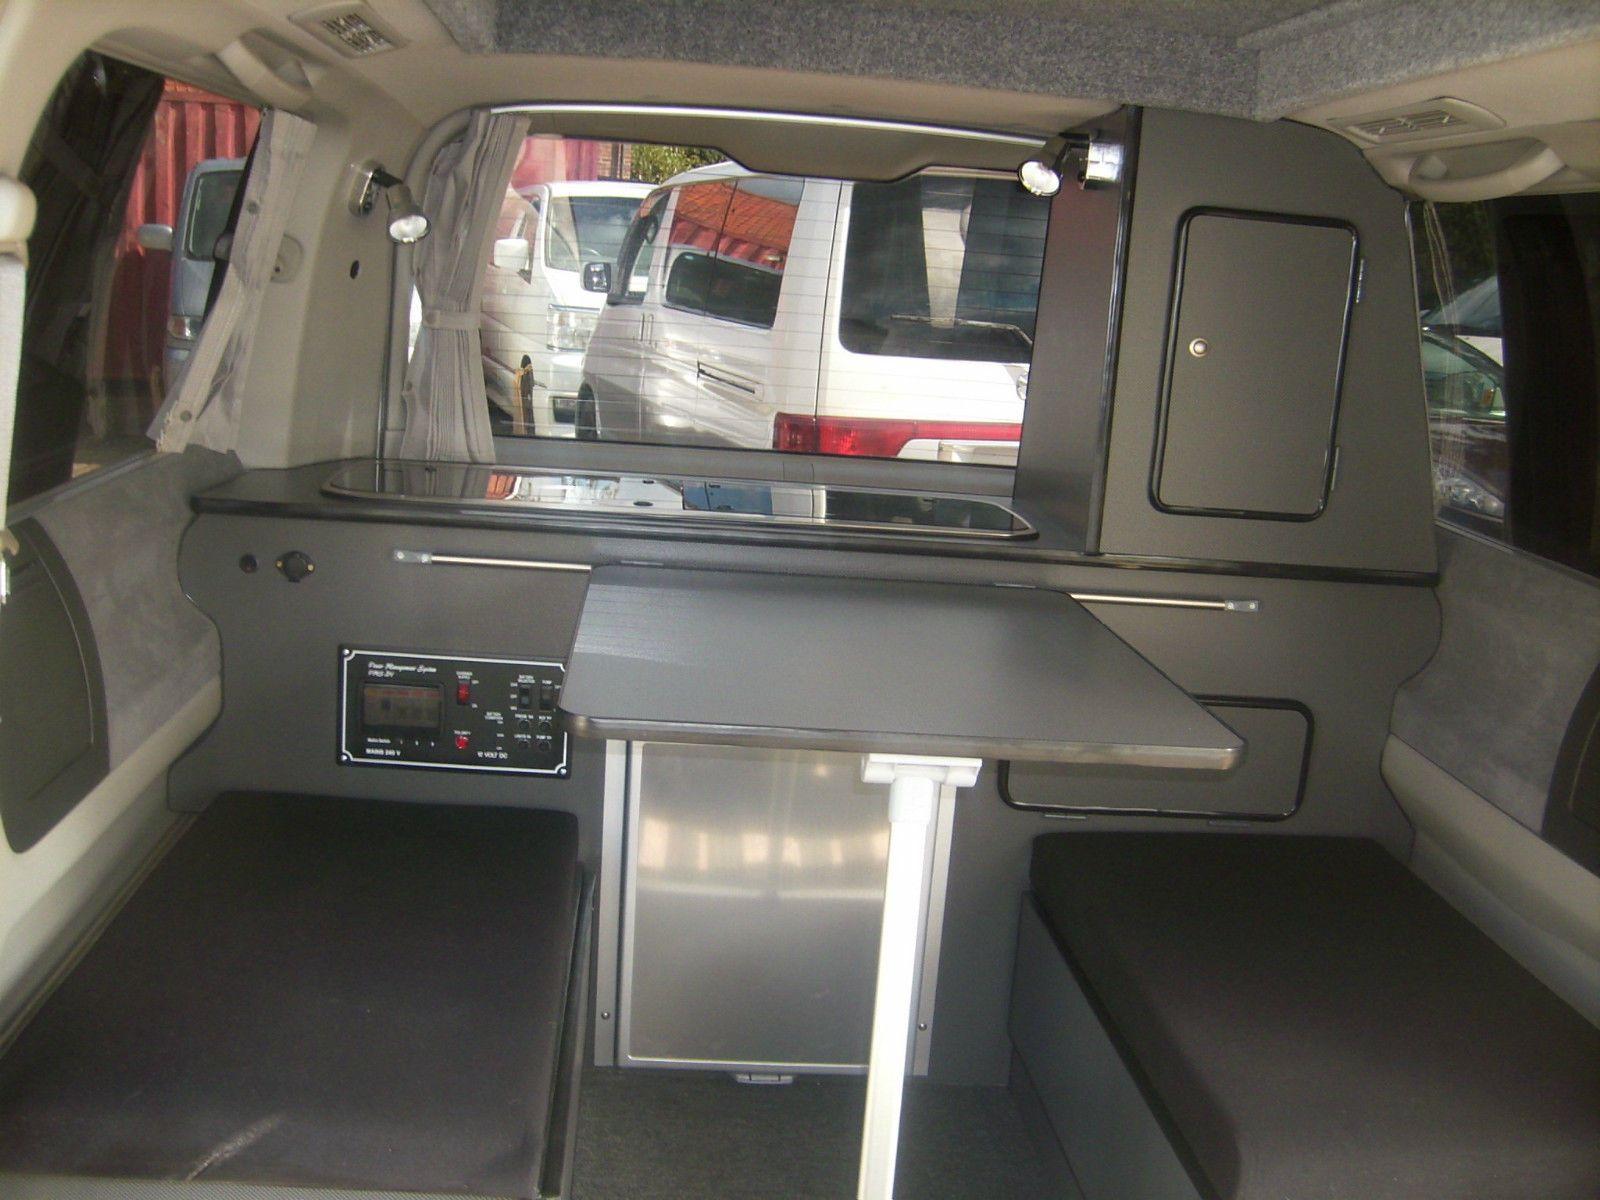 2002 NISSAN ELGRAND HIGHWAY STAR CAMPER LIKE VW T5 T4 ...